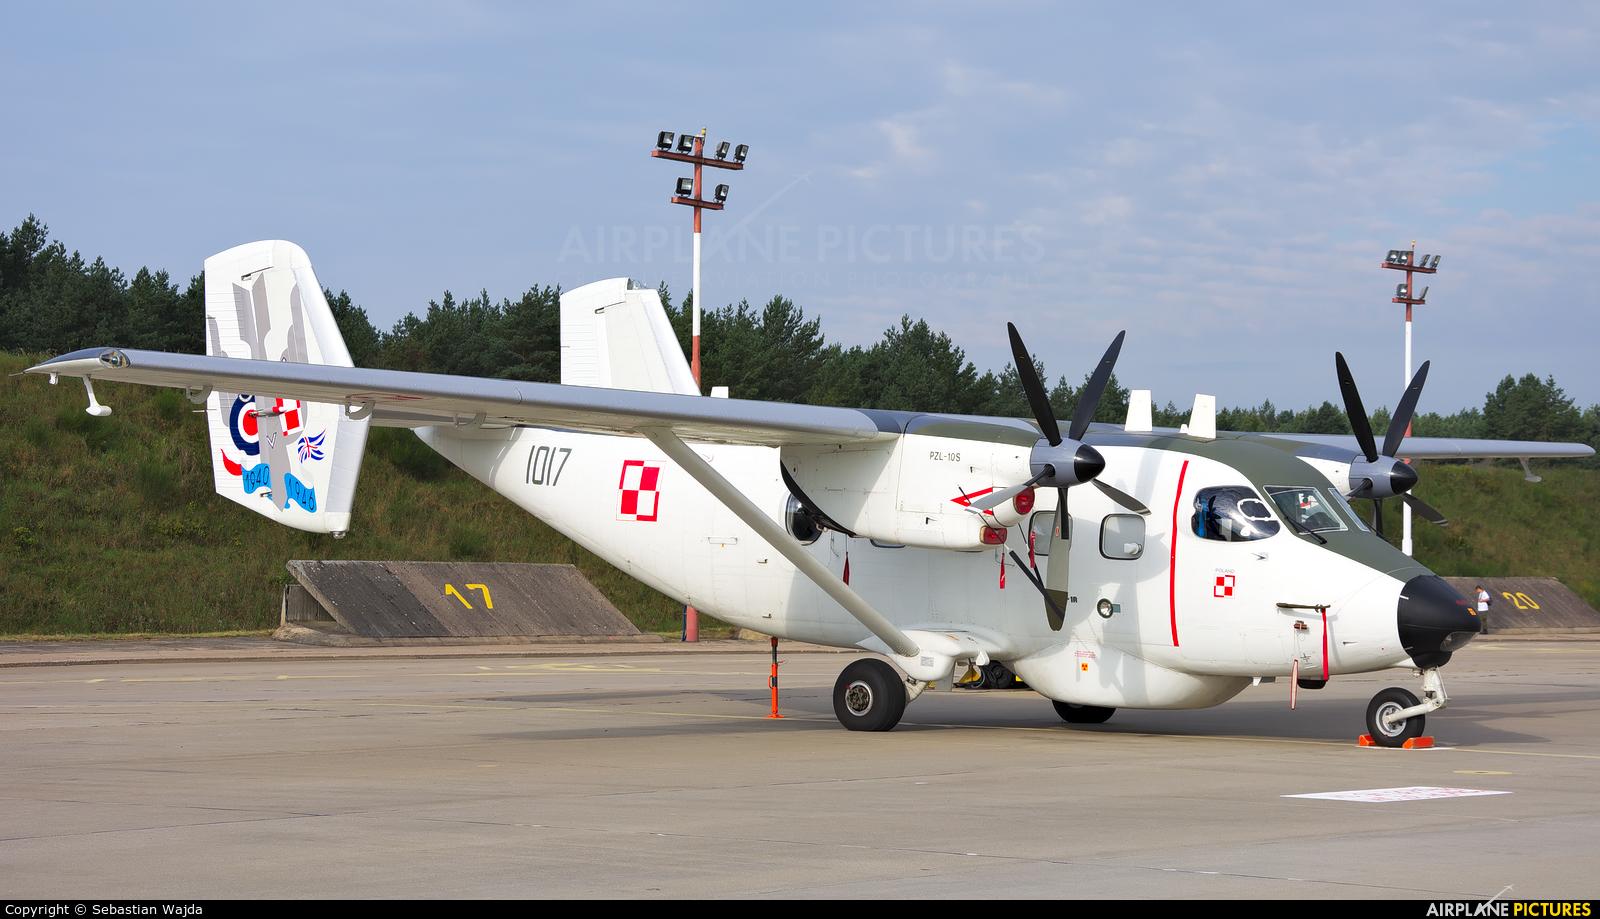 Poland - Navy 1017 aircraft at Mirosławiec